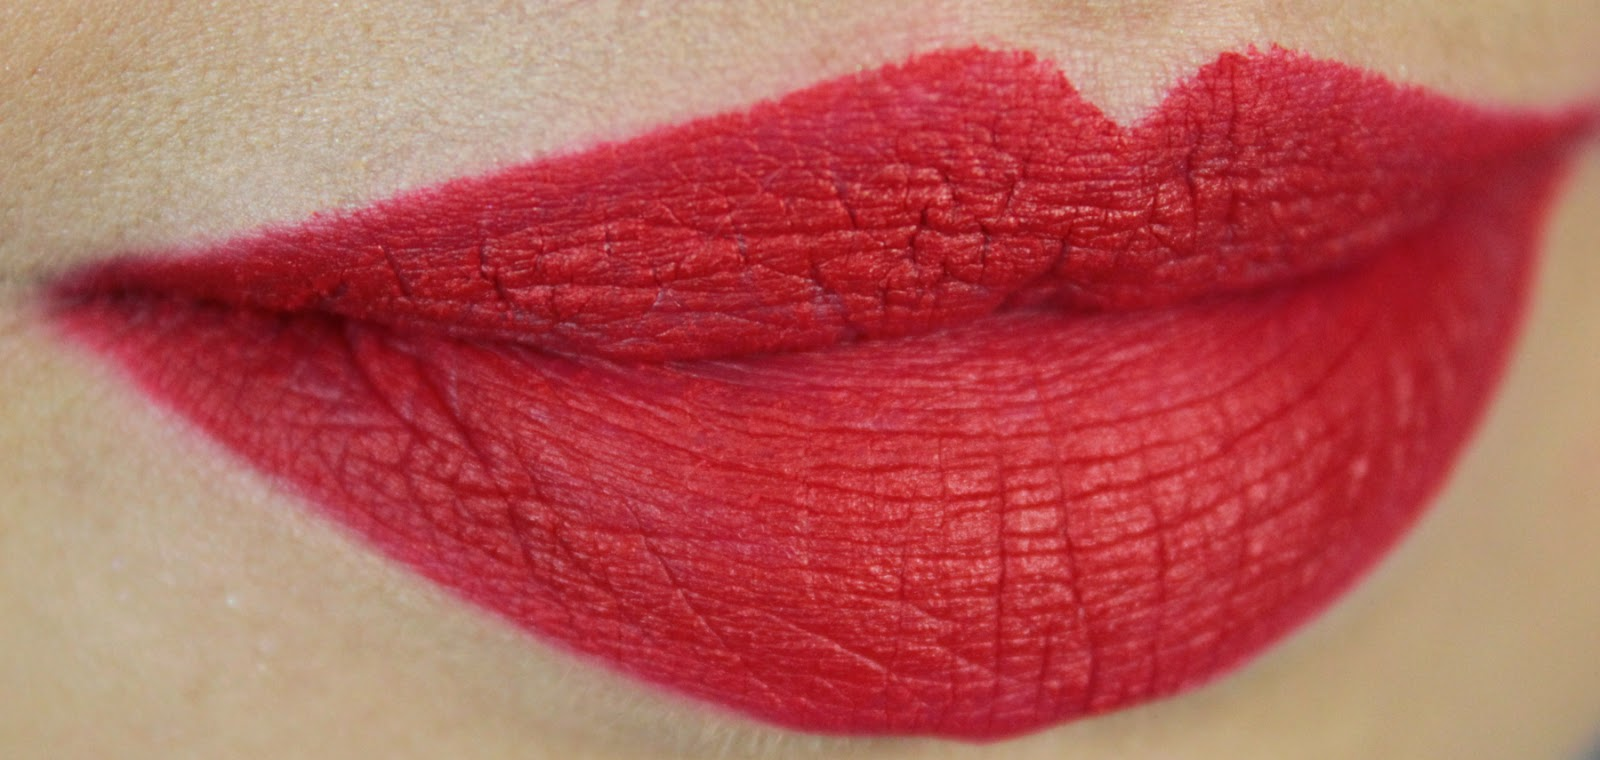 batom, líquido, matte, lipstick, bbb, barato, bom, max love, maquiagem, famosa, fashion mimi, swatches, vídeo